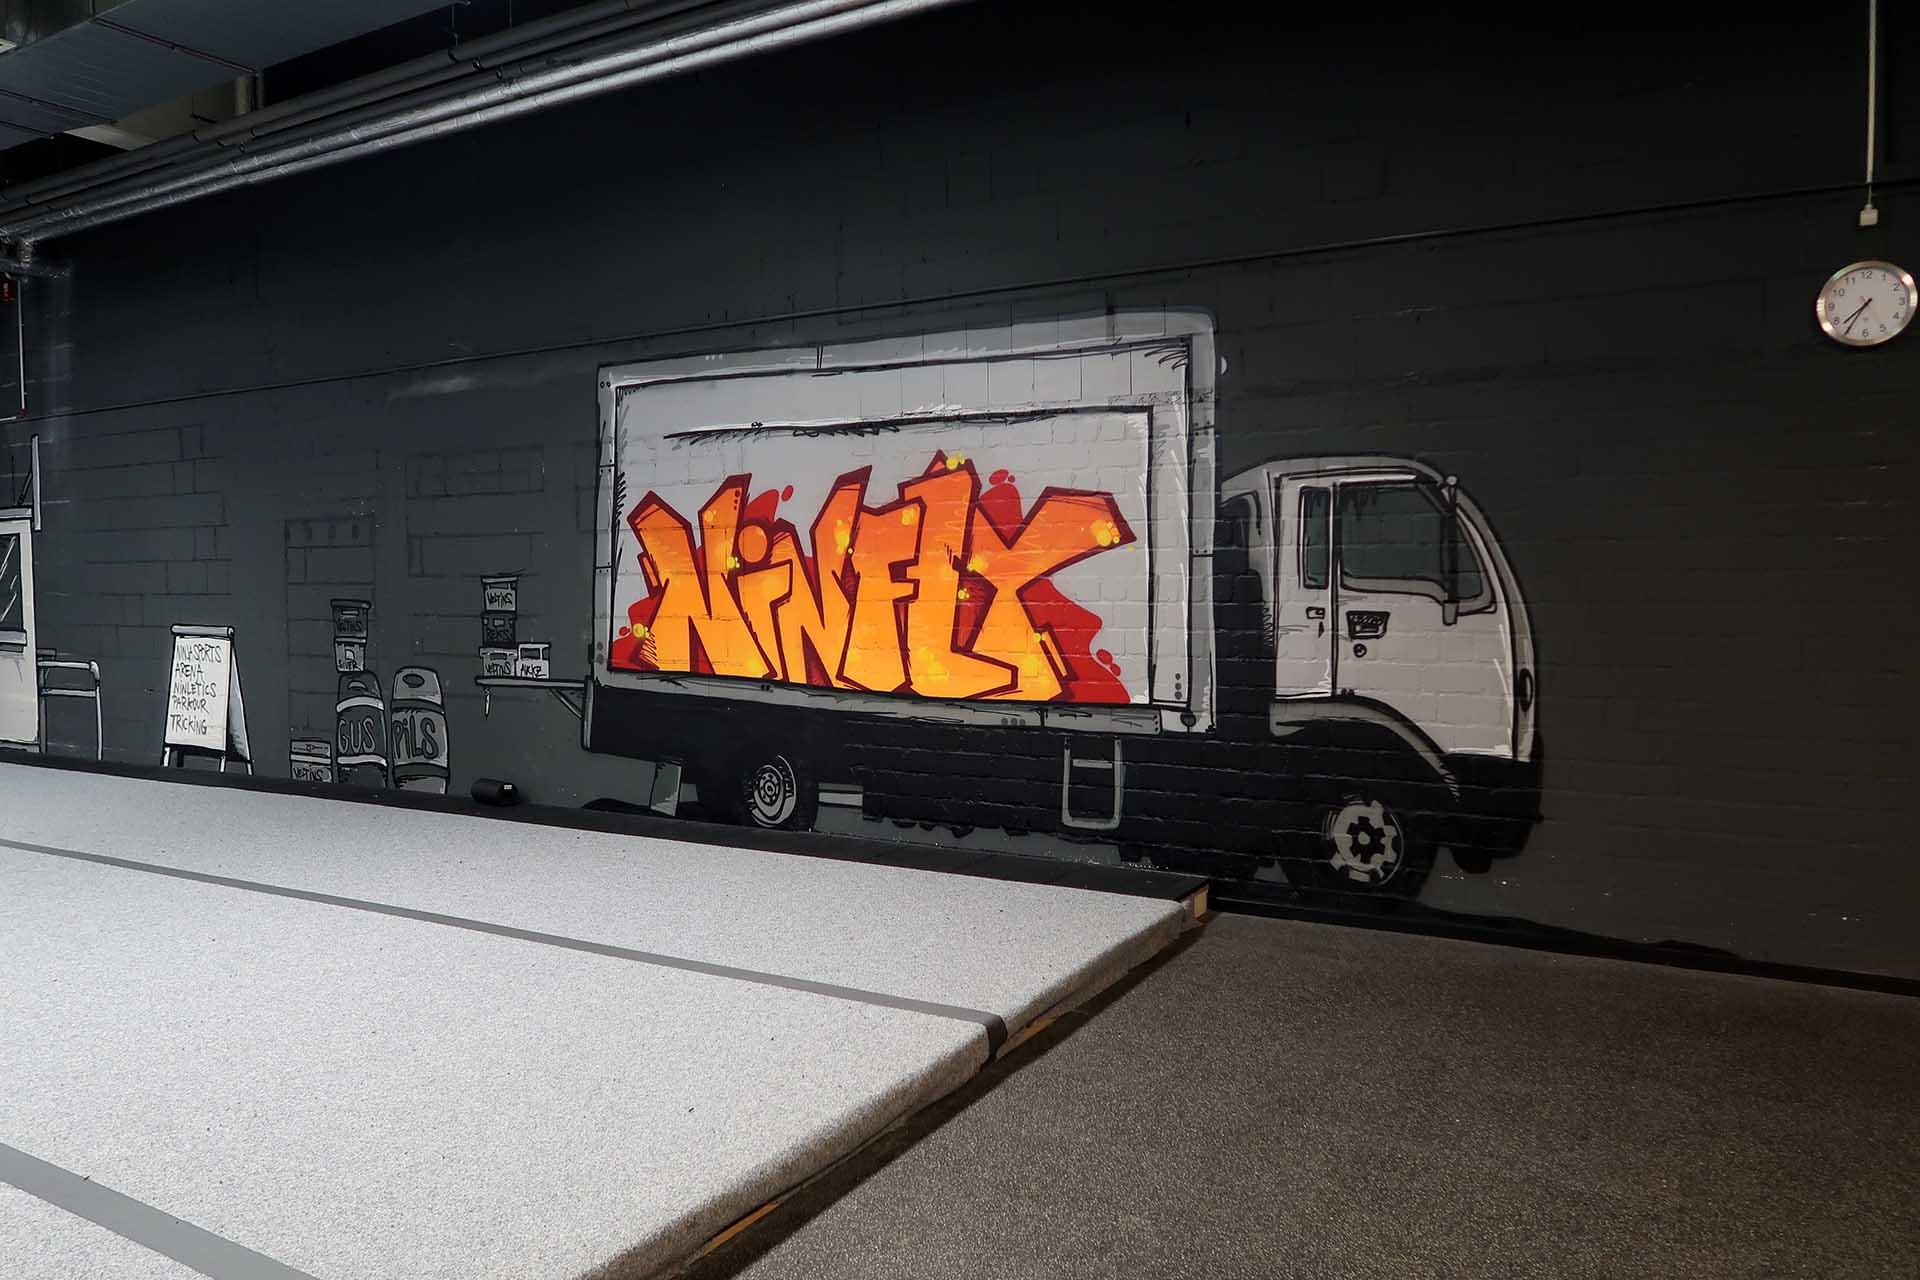 Ninfly, Graffiti, Kulissen, Metro, Häuser, Themenwelt, Sprayen, Design, Bennet Grüttner